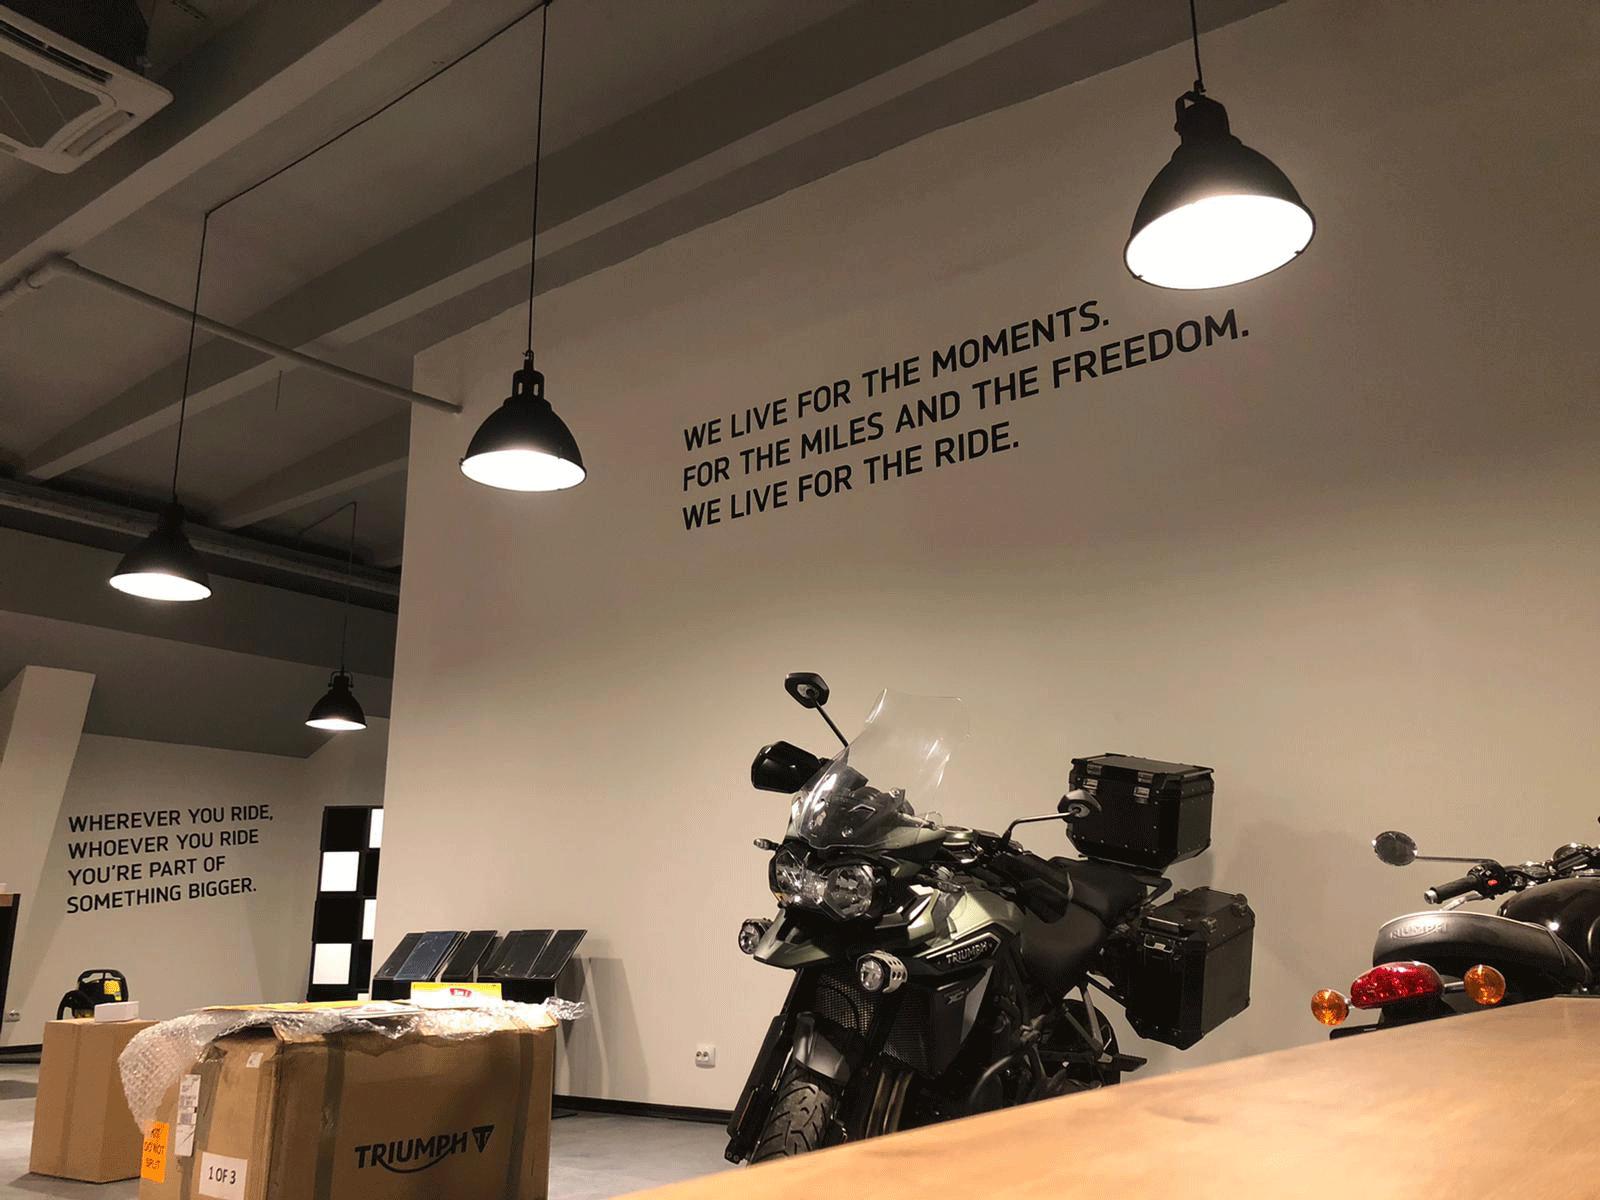 30w bay lights lits motorcycle